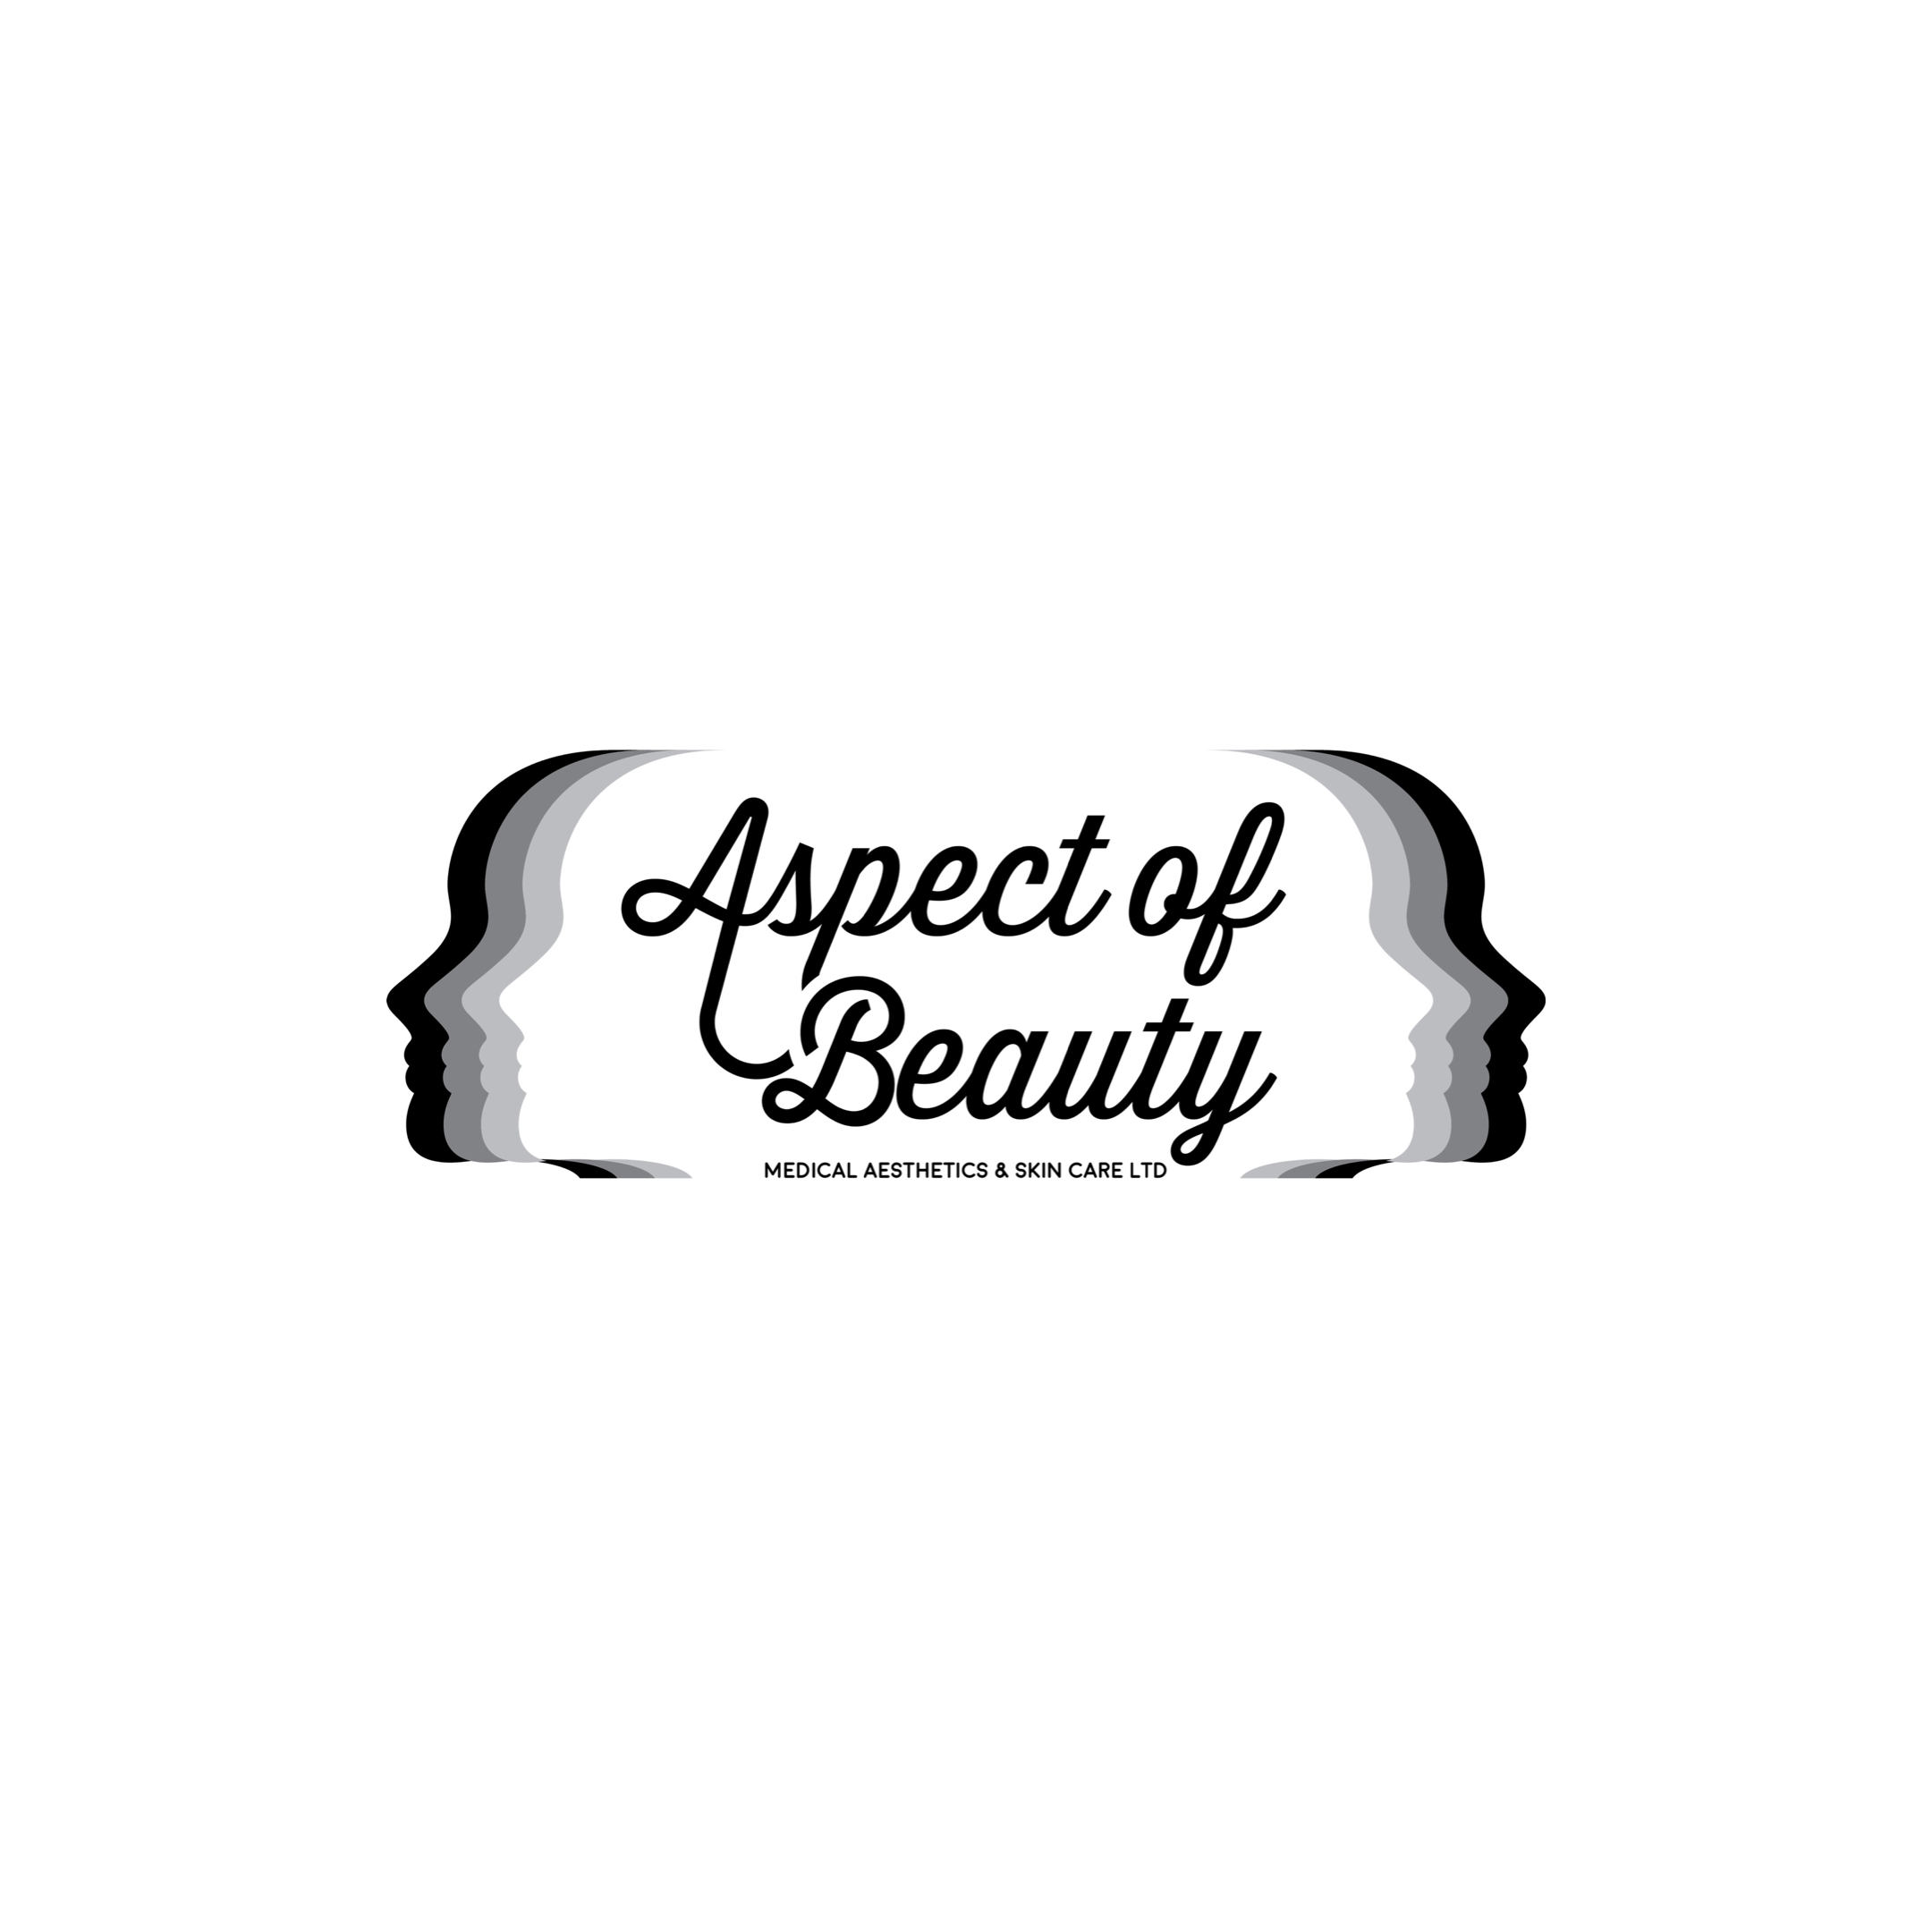 Aspect of Beauty